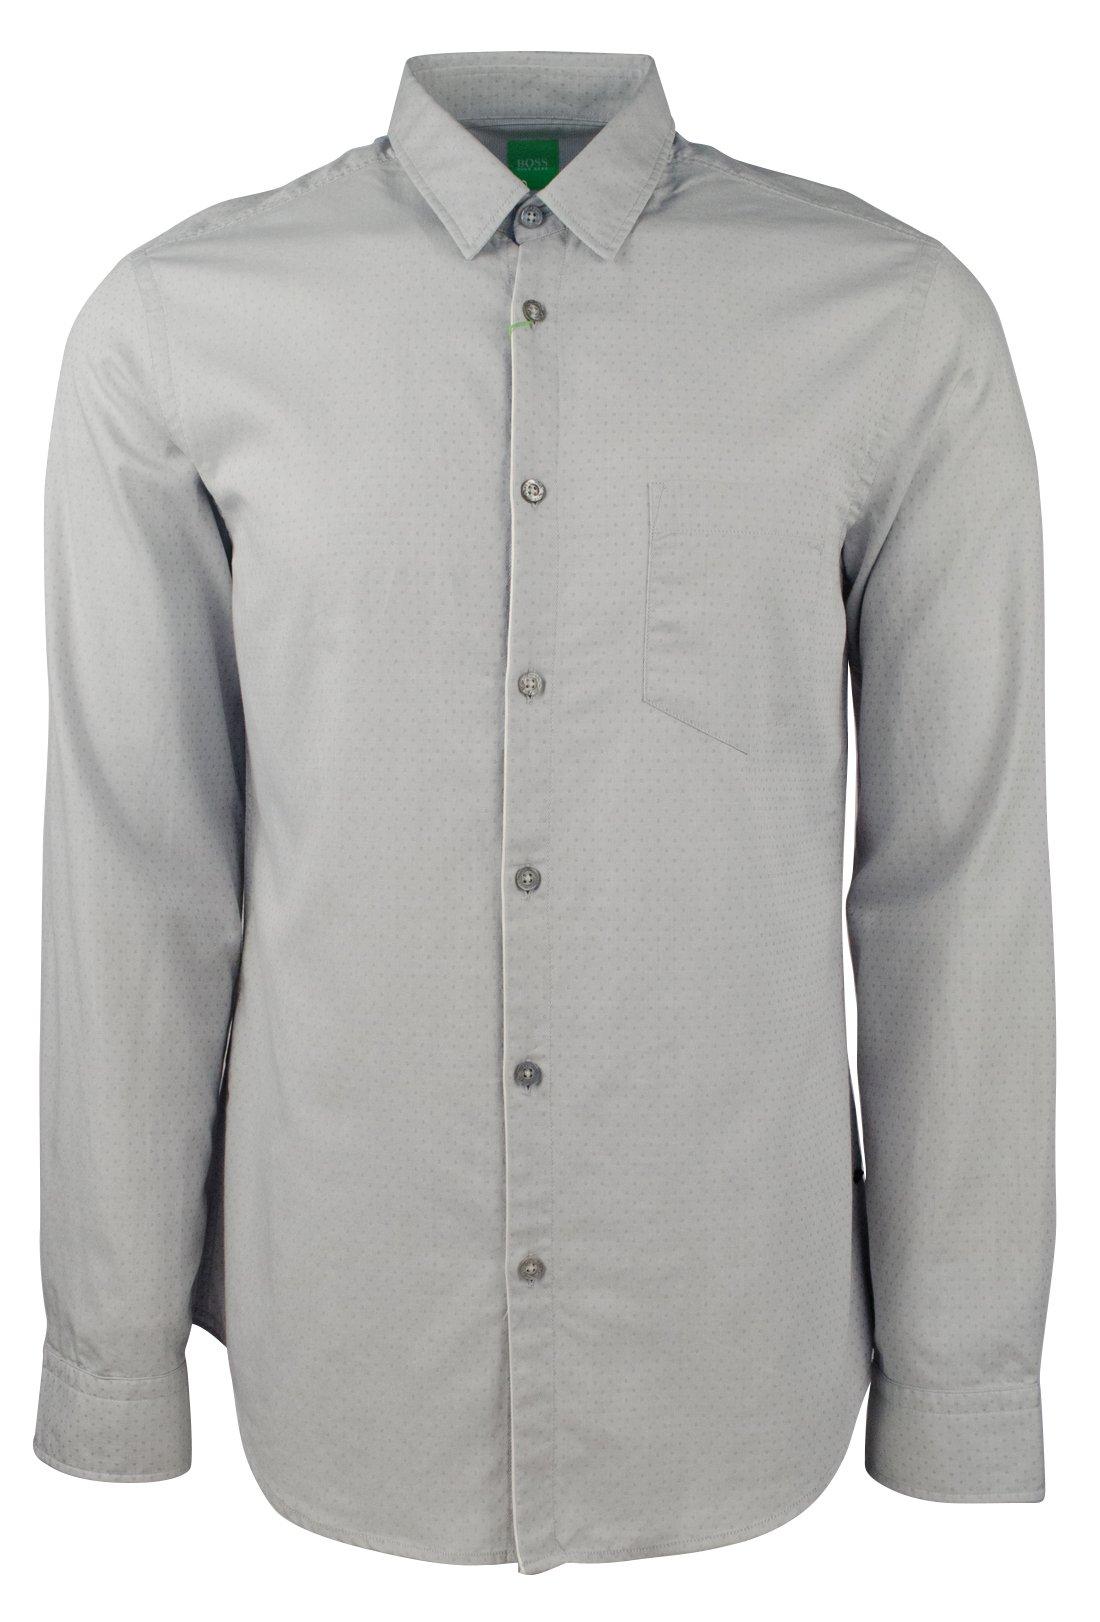 Hugo Boss Men's Green Label C-Barnaba Regular Fit Shirt-LG-XL